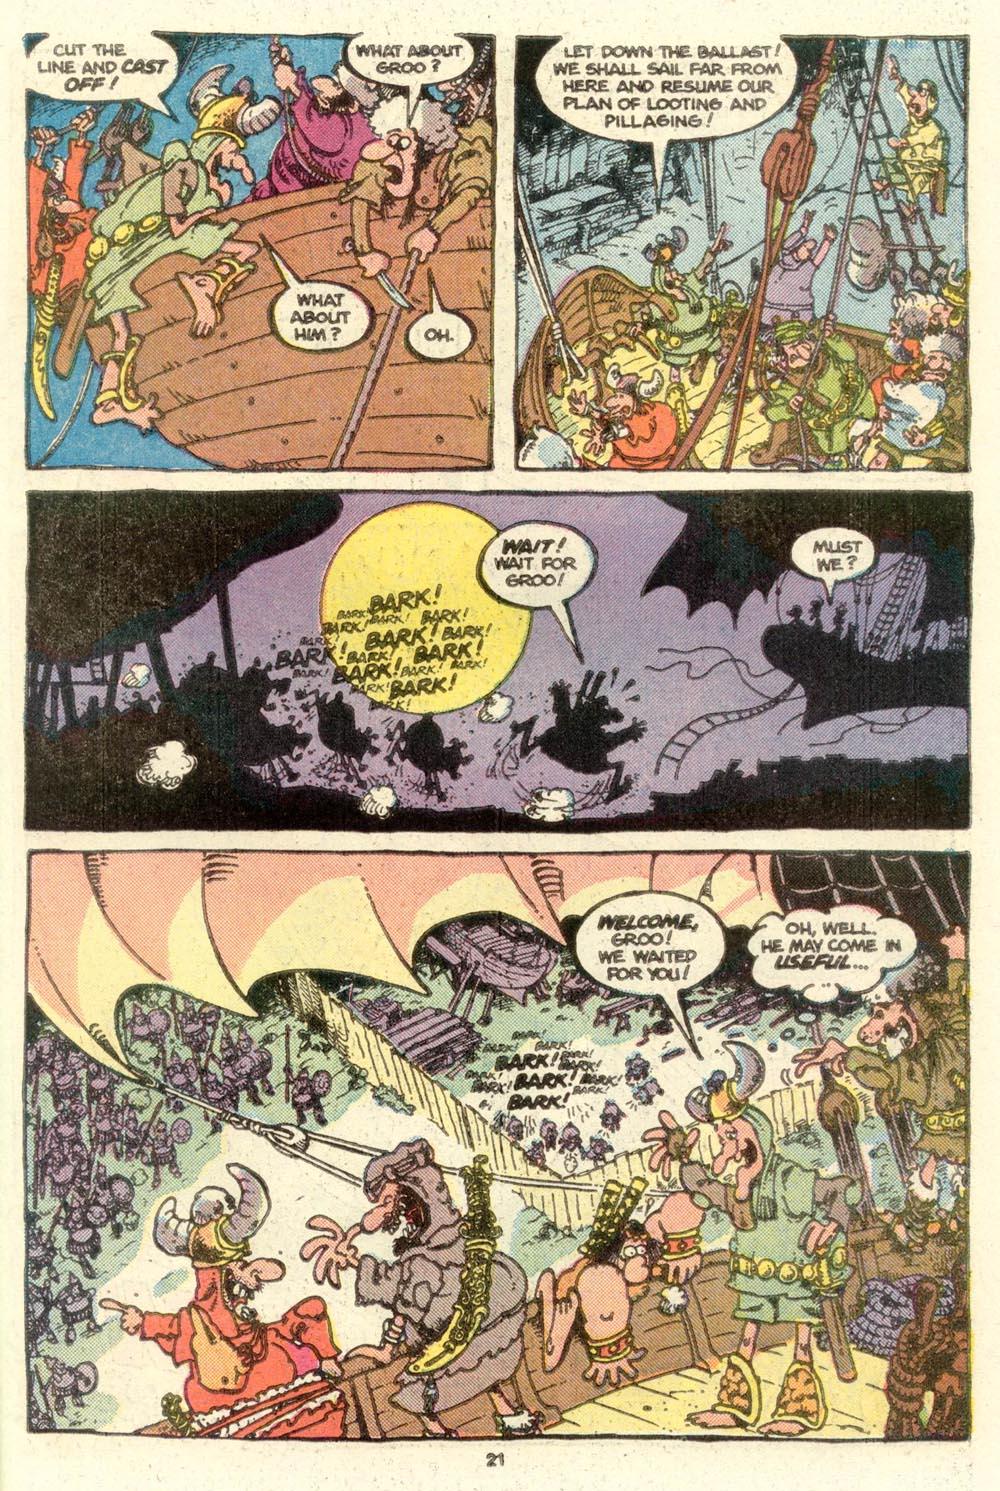 Read online Sergio Aragonés Groo the Wanderer comic -  Issue #16 - 22